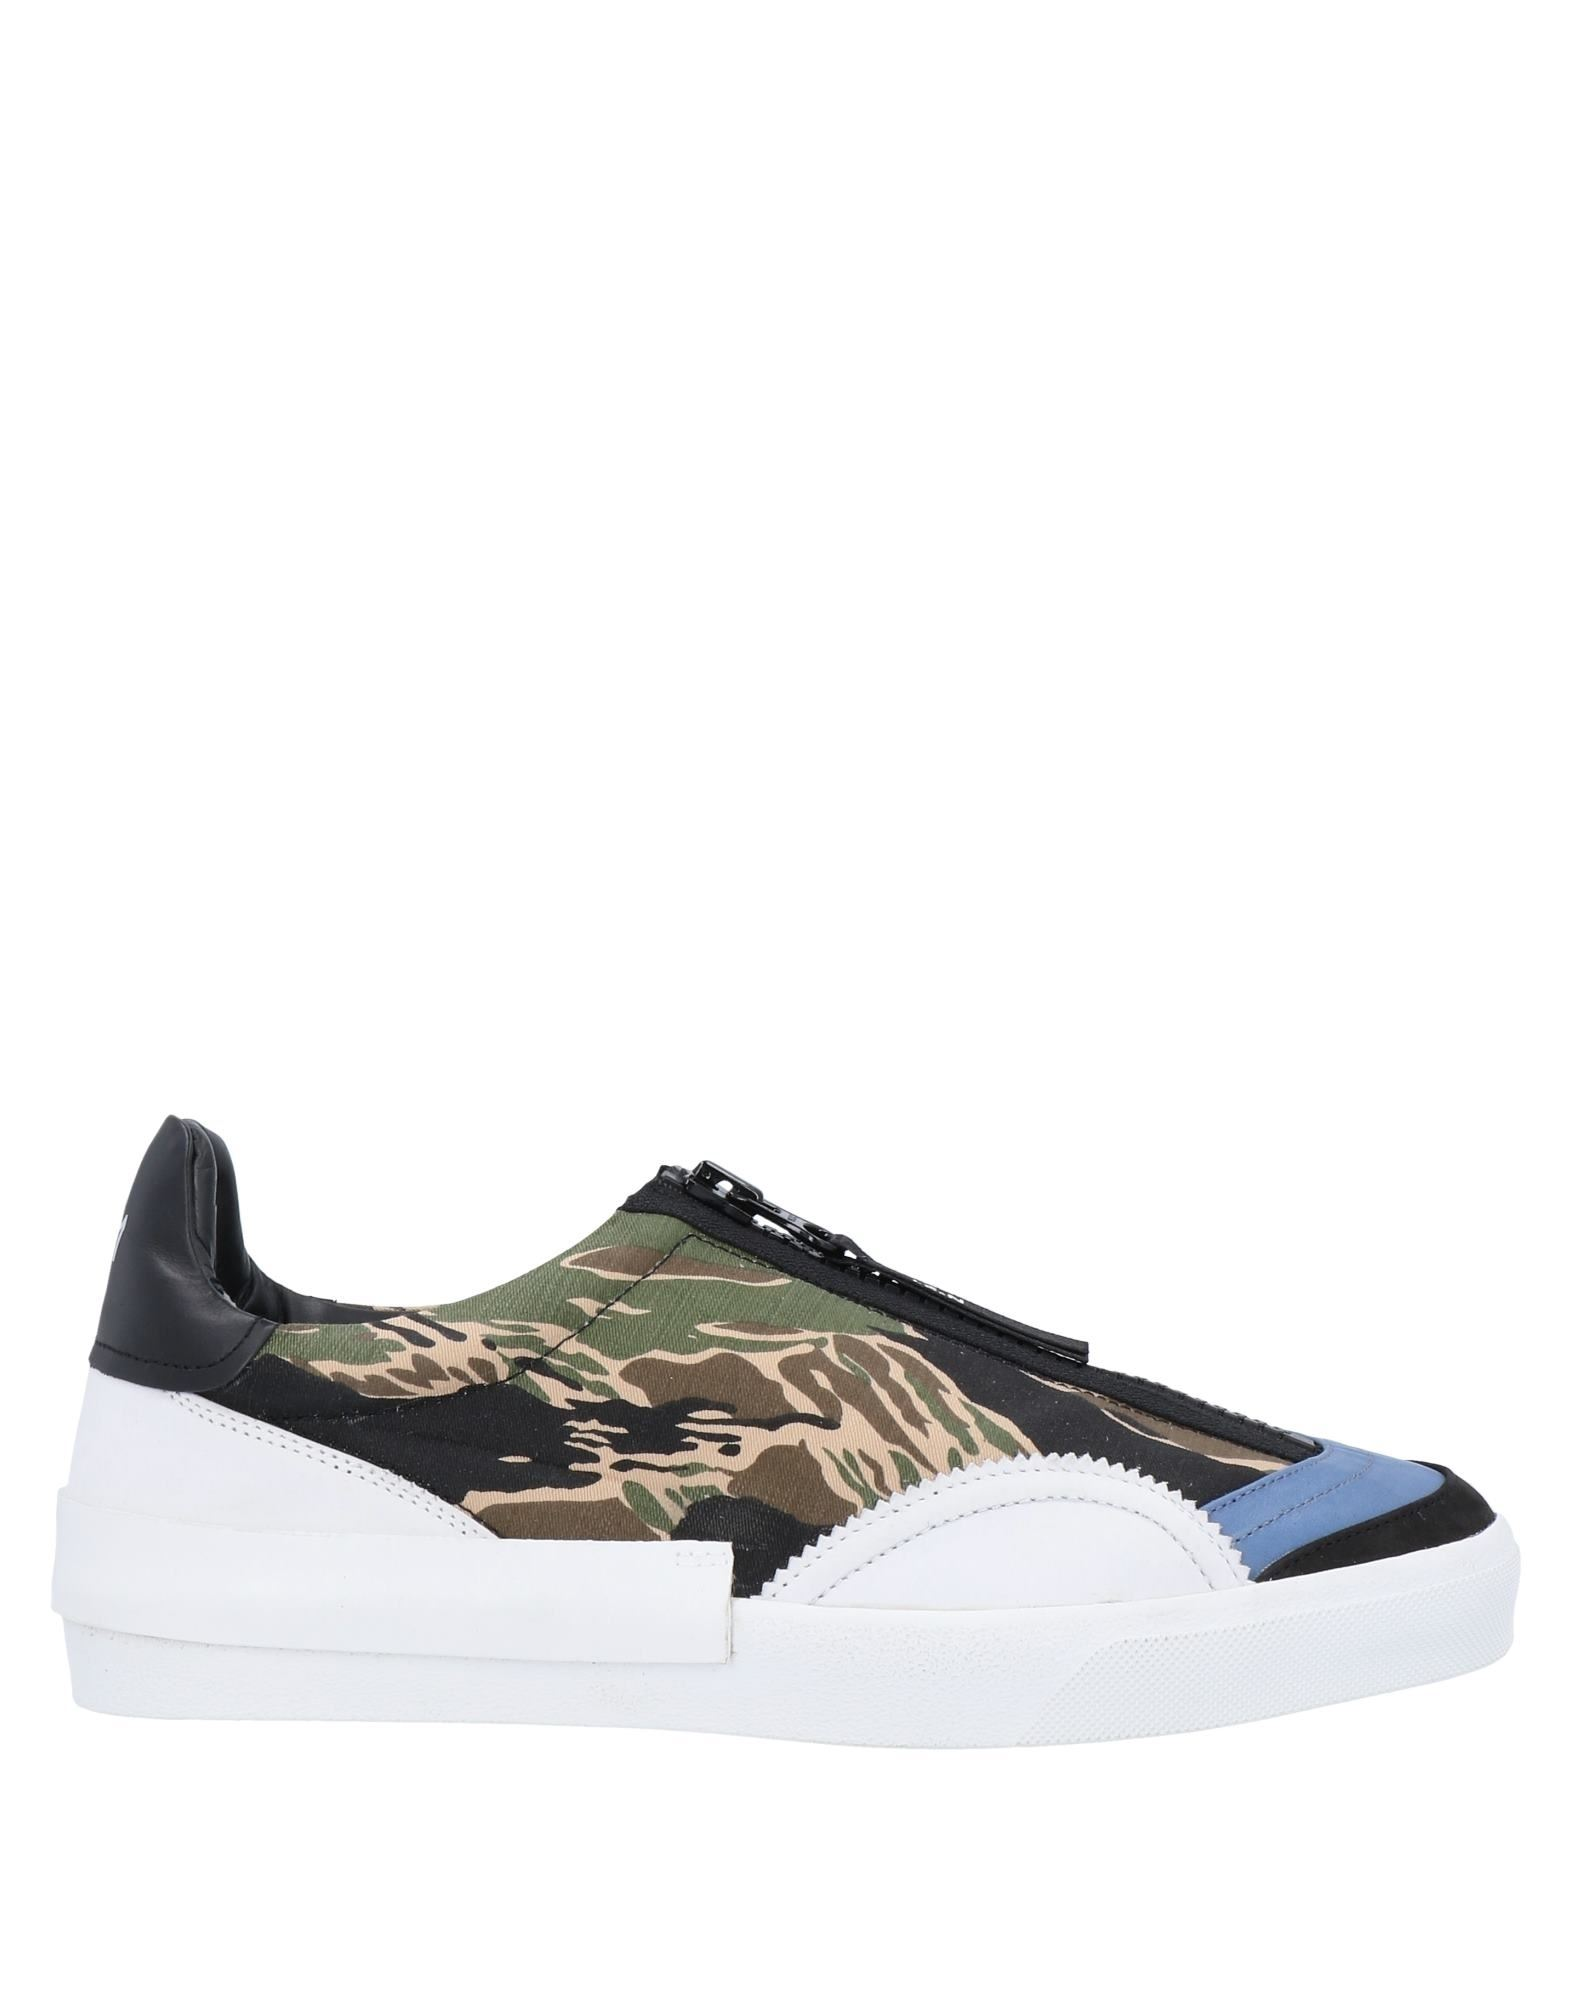 Ndegree21 Low-tops & sneakers - Item 17035220